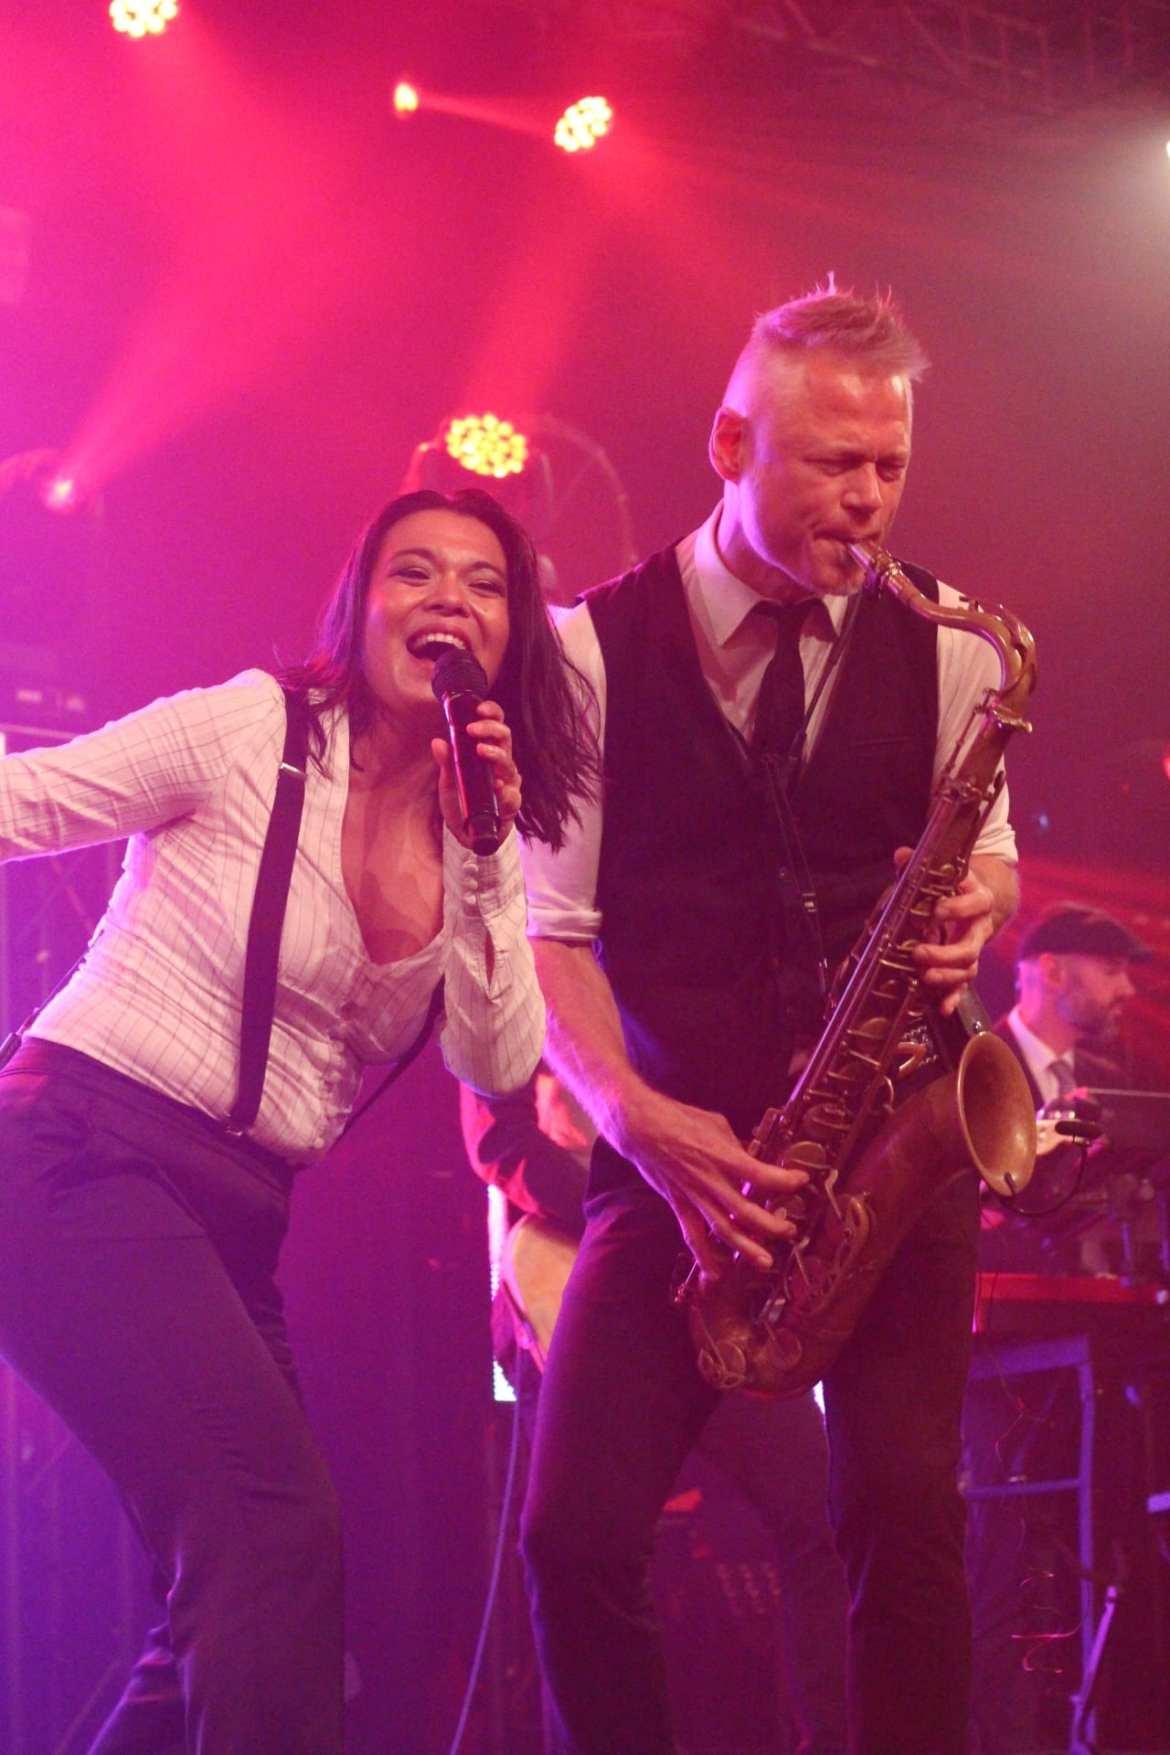 Big Black and Beautiful Live DMG Mandemakers Waalwijk | feestband.com